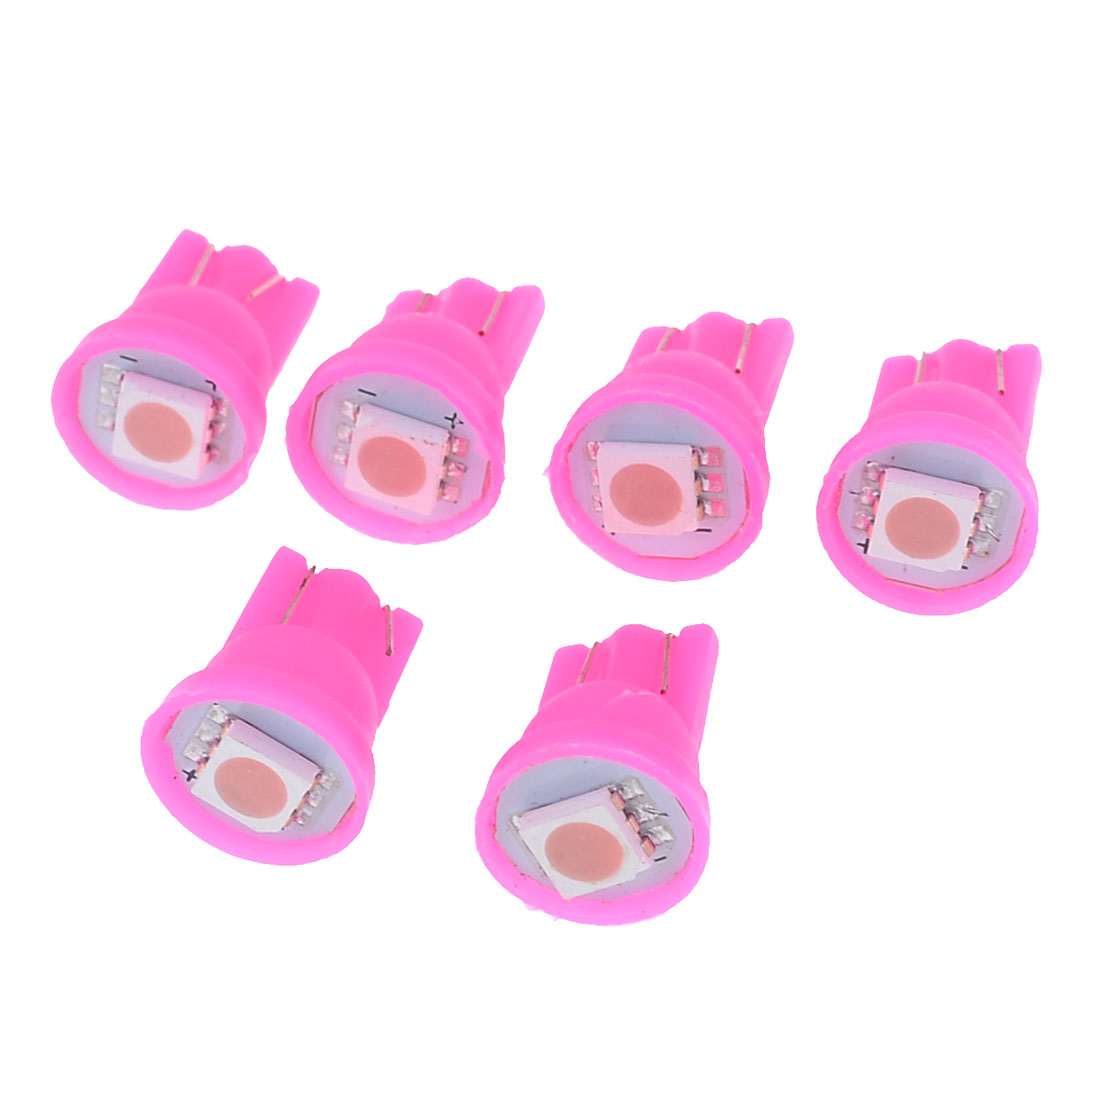 Unique Bargains 6 x T10 194 152 Wedge Pink 5050 SMD LED Car Tail Break Light Lamp Bulb